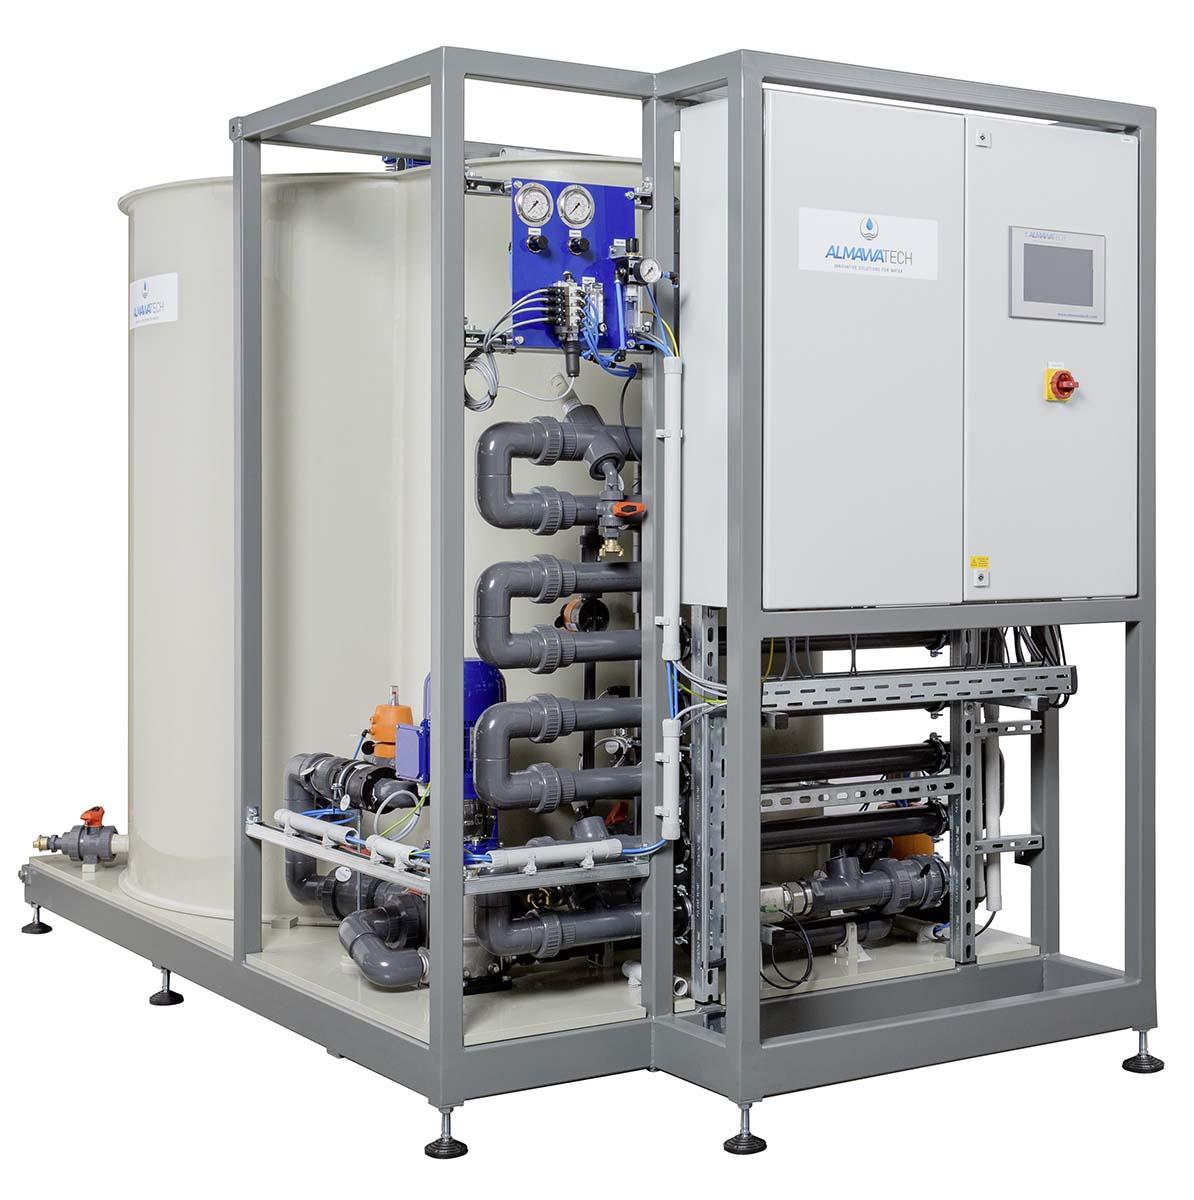 Abwasseraufbereitung_Almawatech